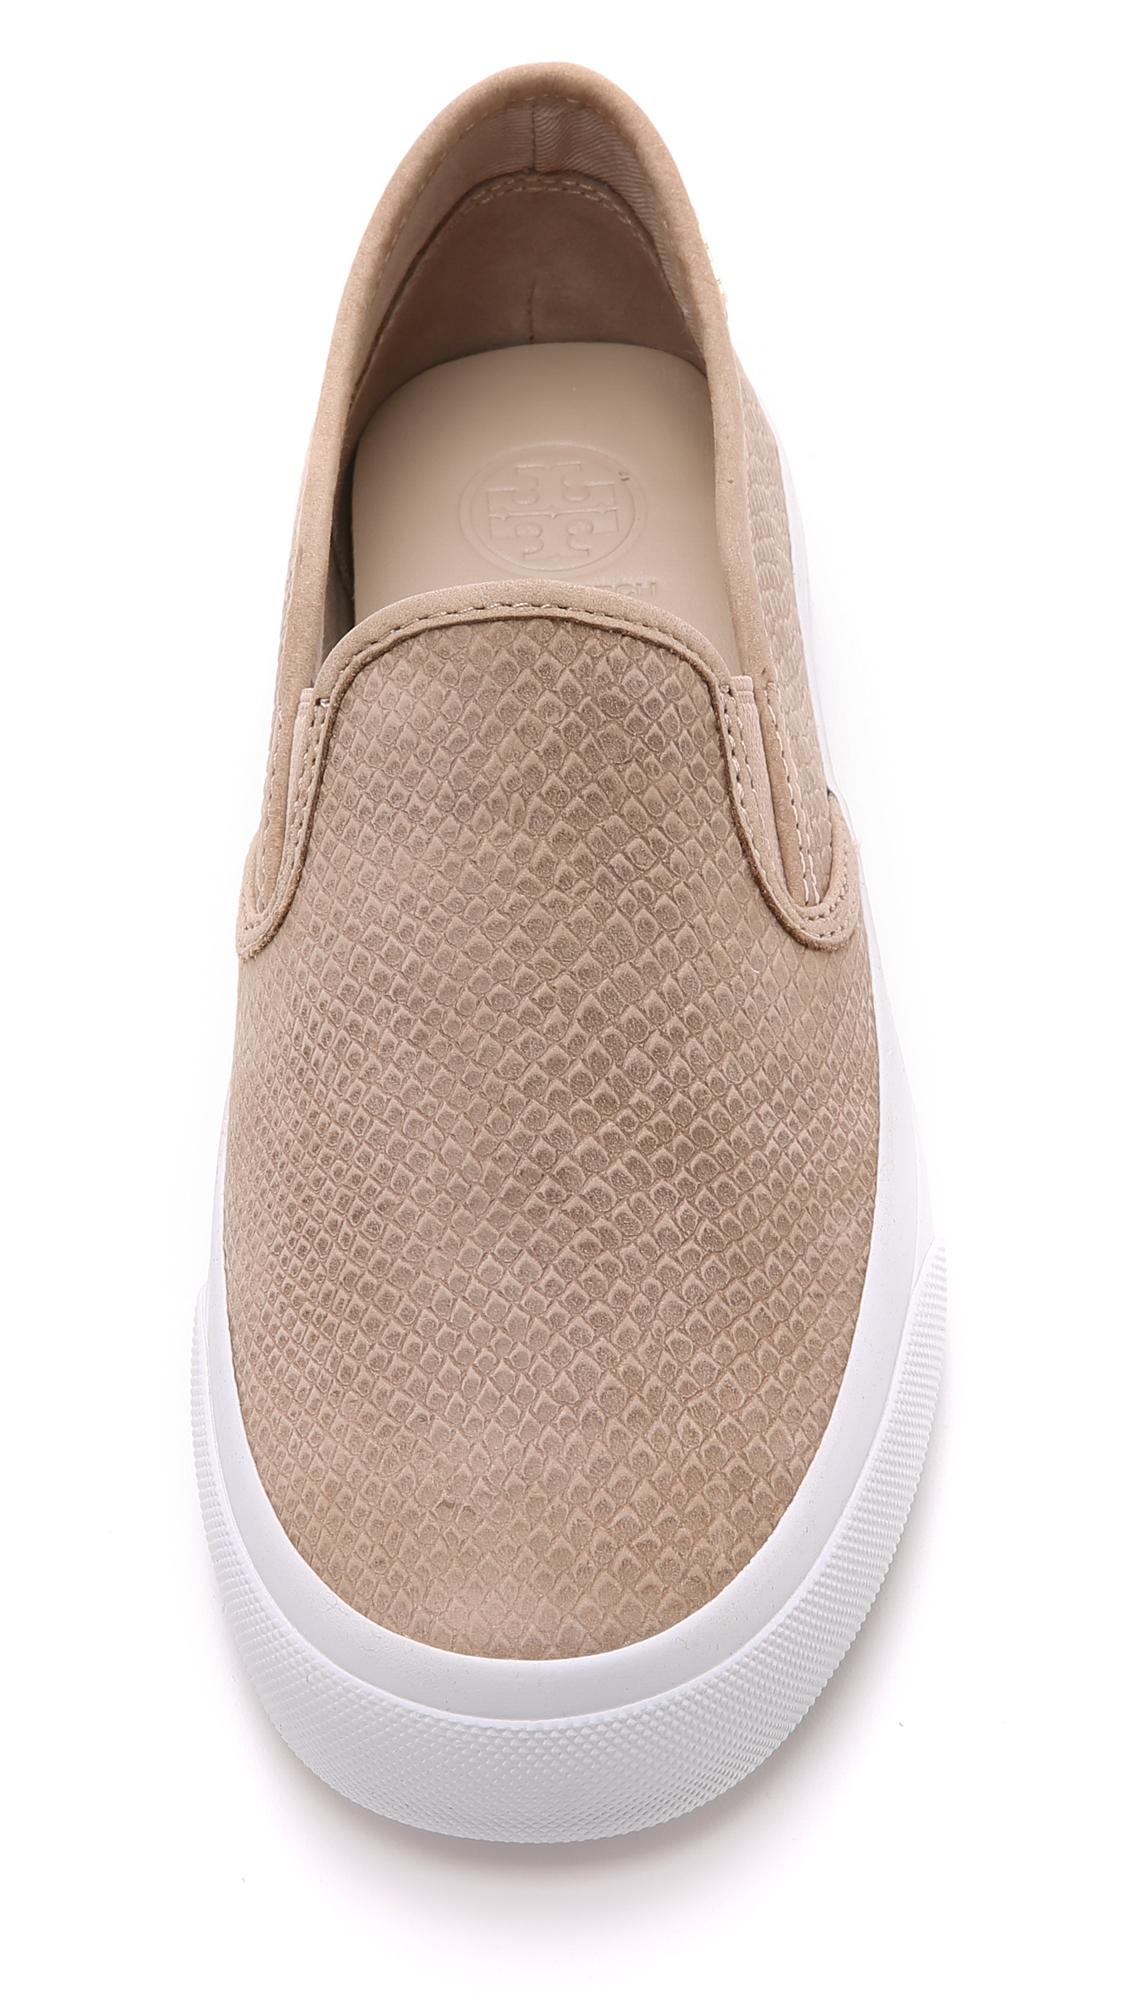 0795b2a3b Tory burch floyd slip on sneakers shopbop jpg 1128x2000 Tory burch slide ons